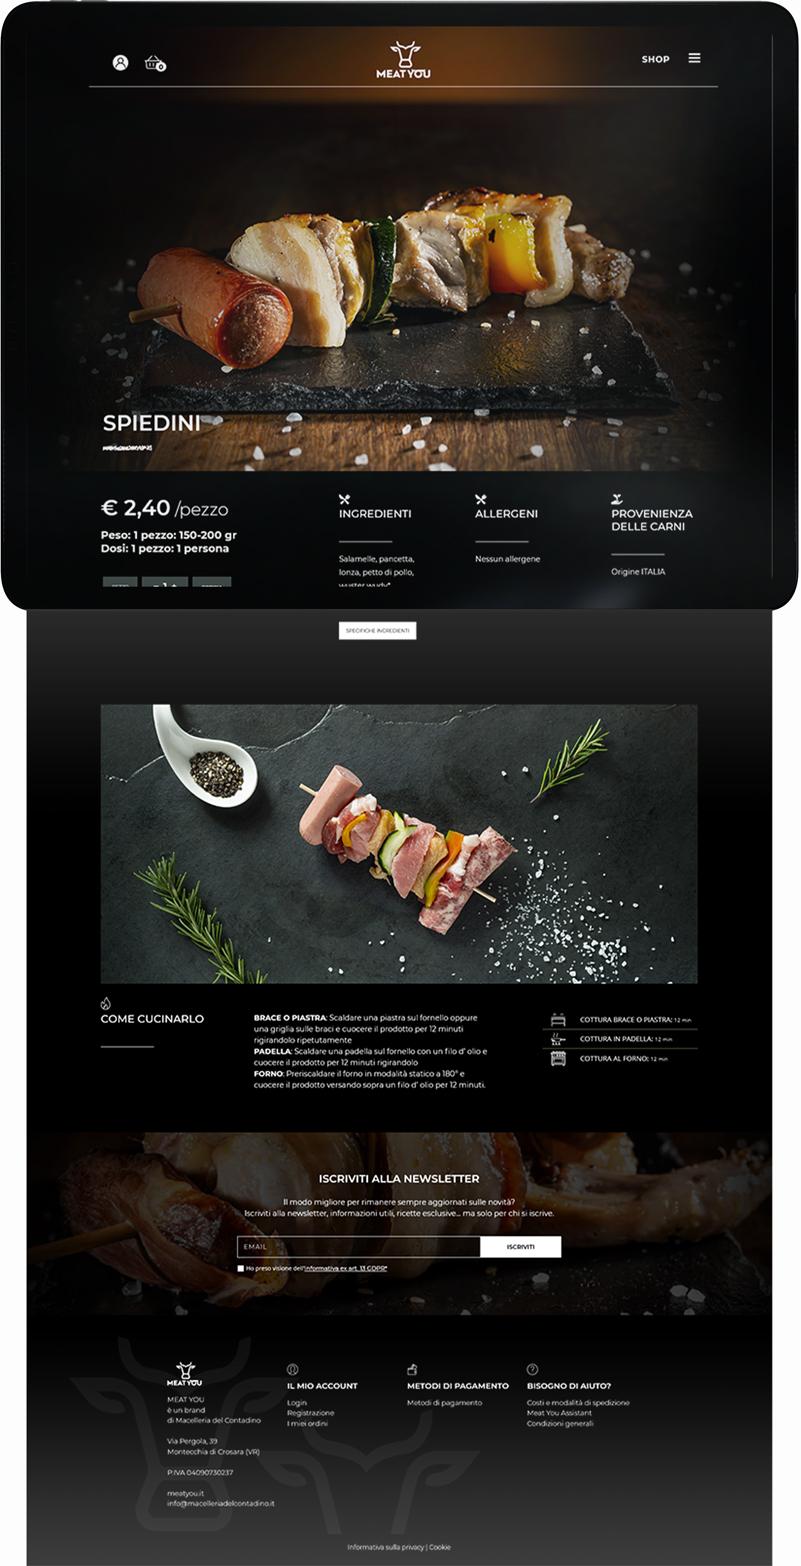 Ecommerce e siti web Verona - MeatYou | OIS Web Agency